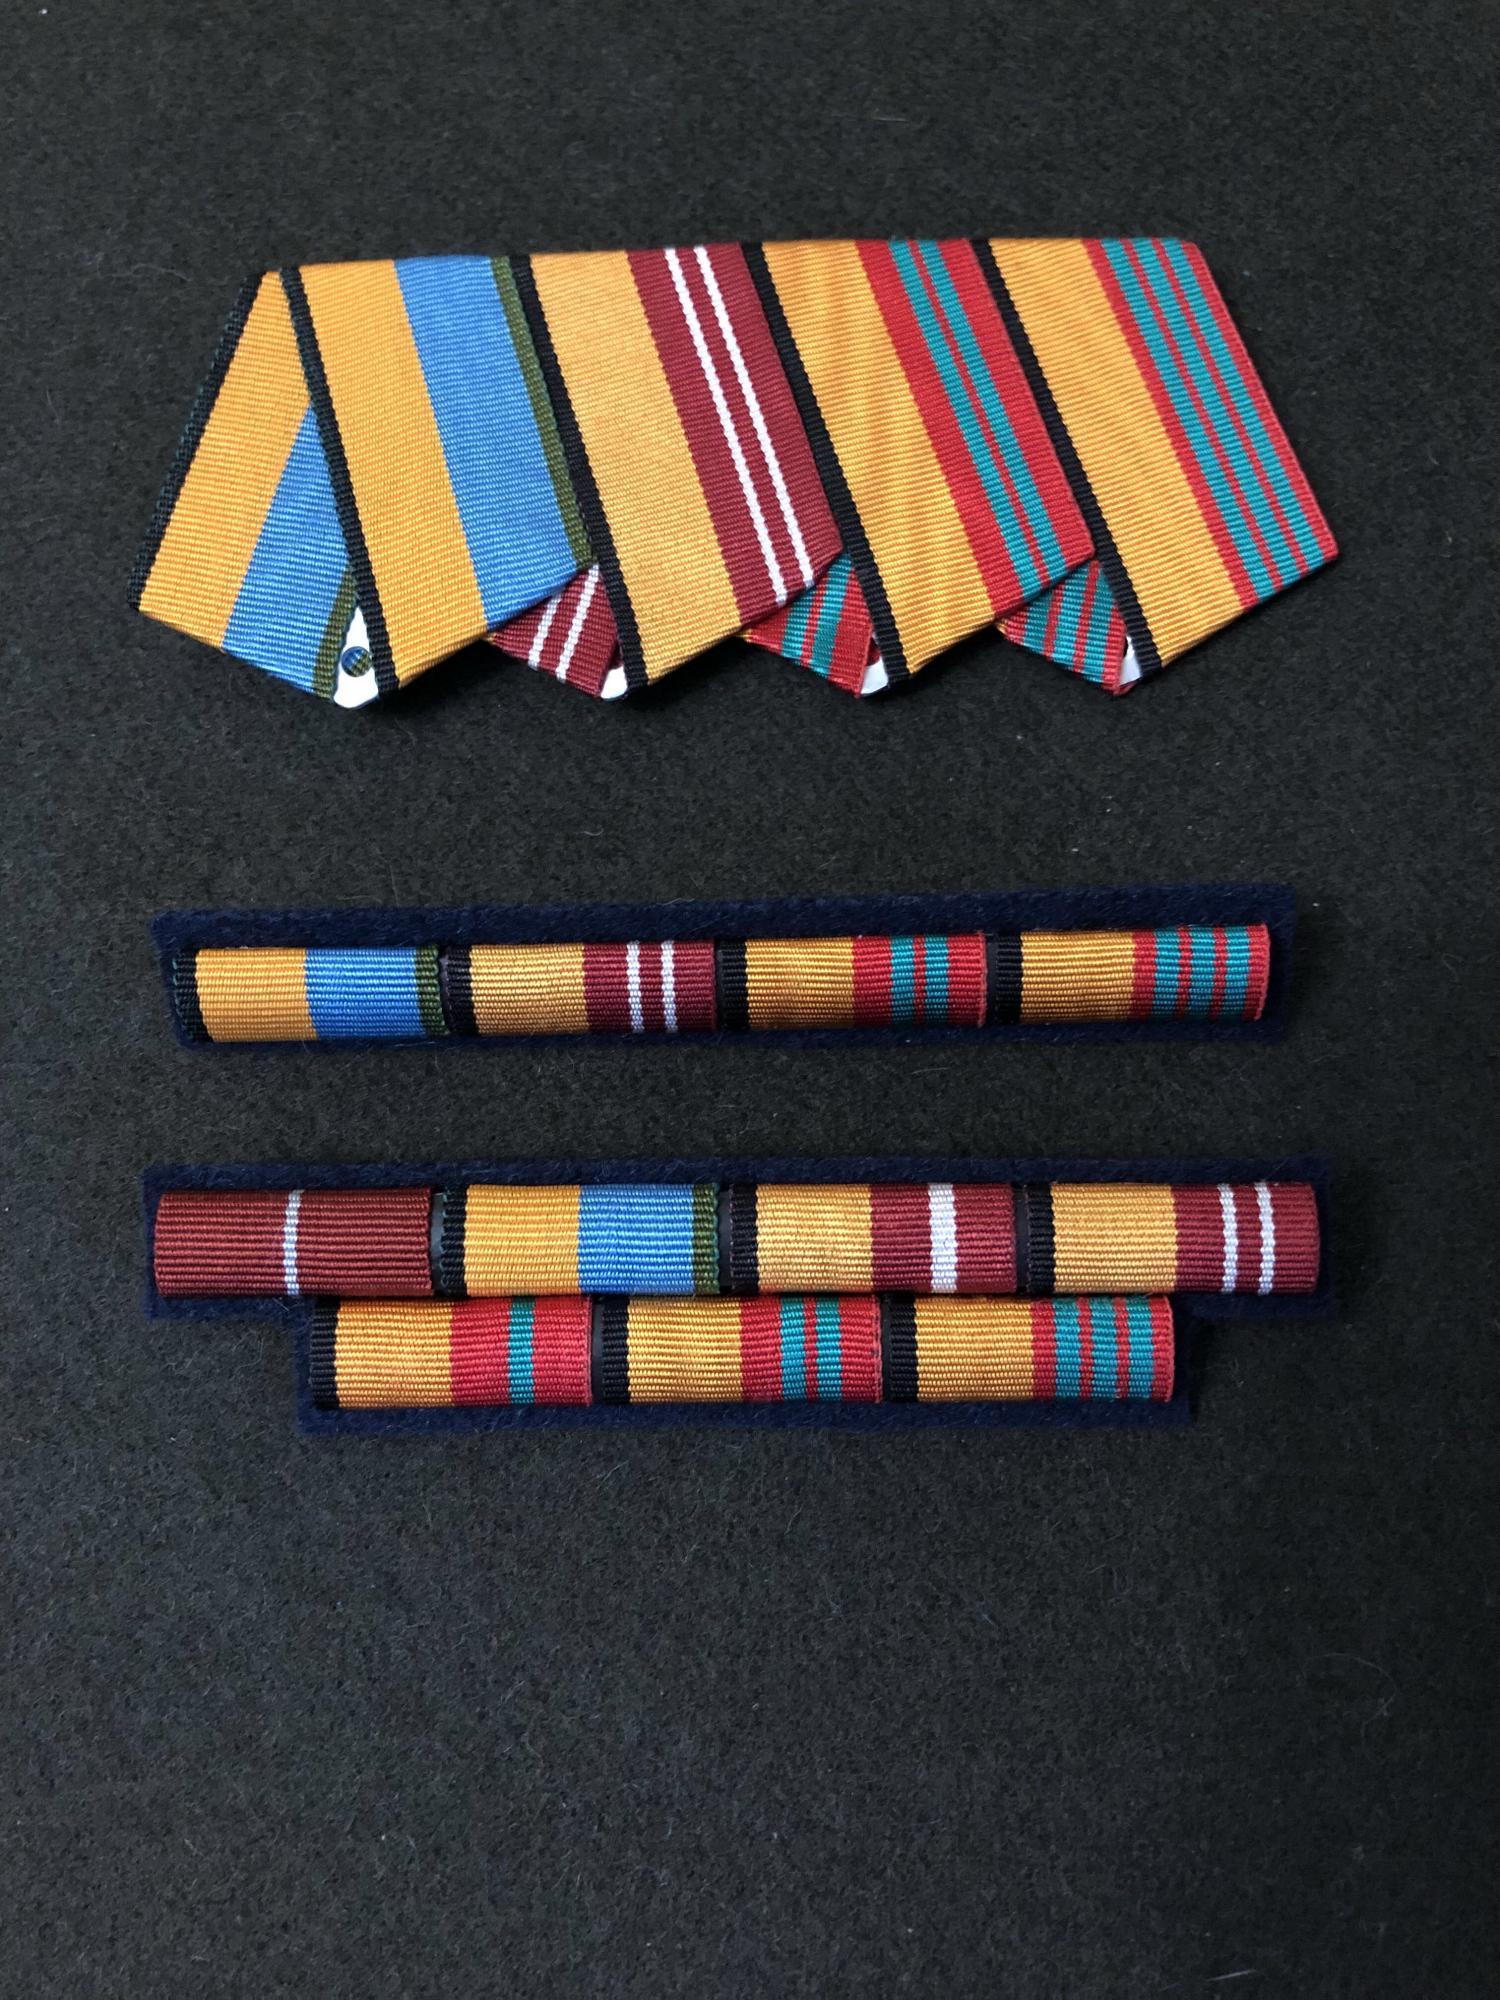 Service ribbon, pad